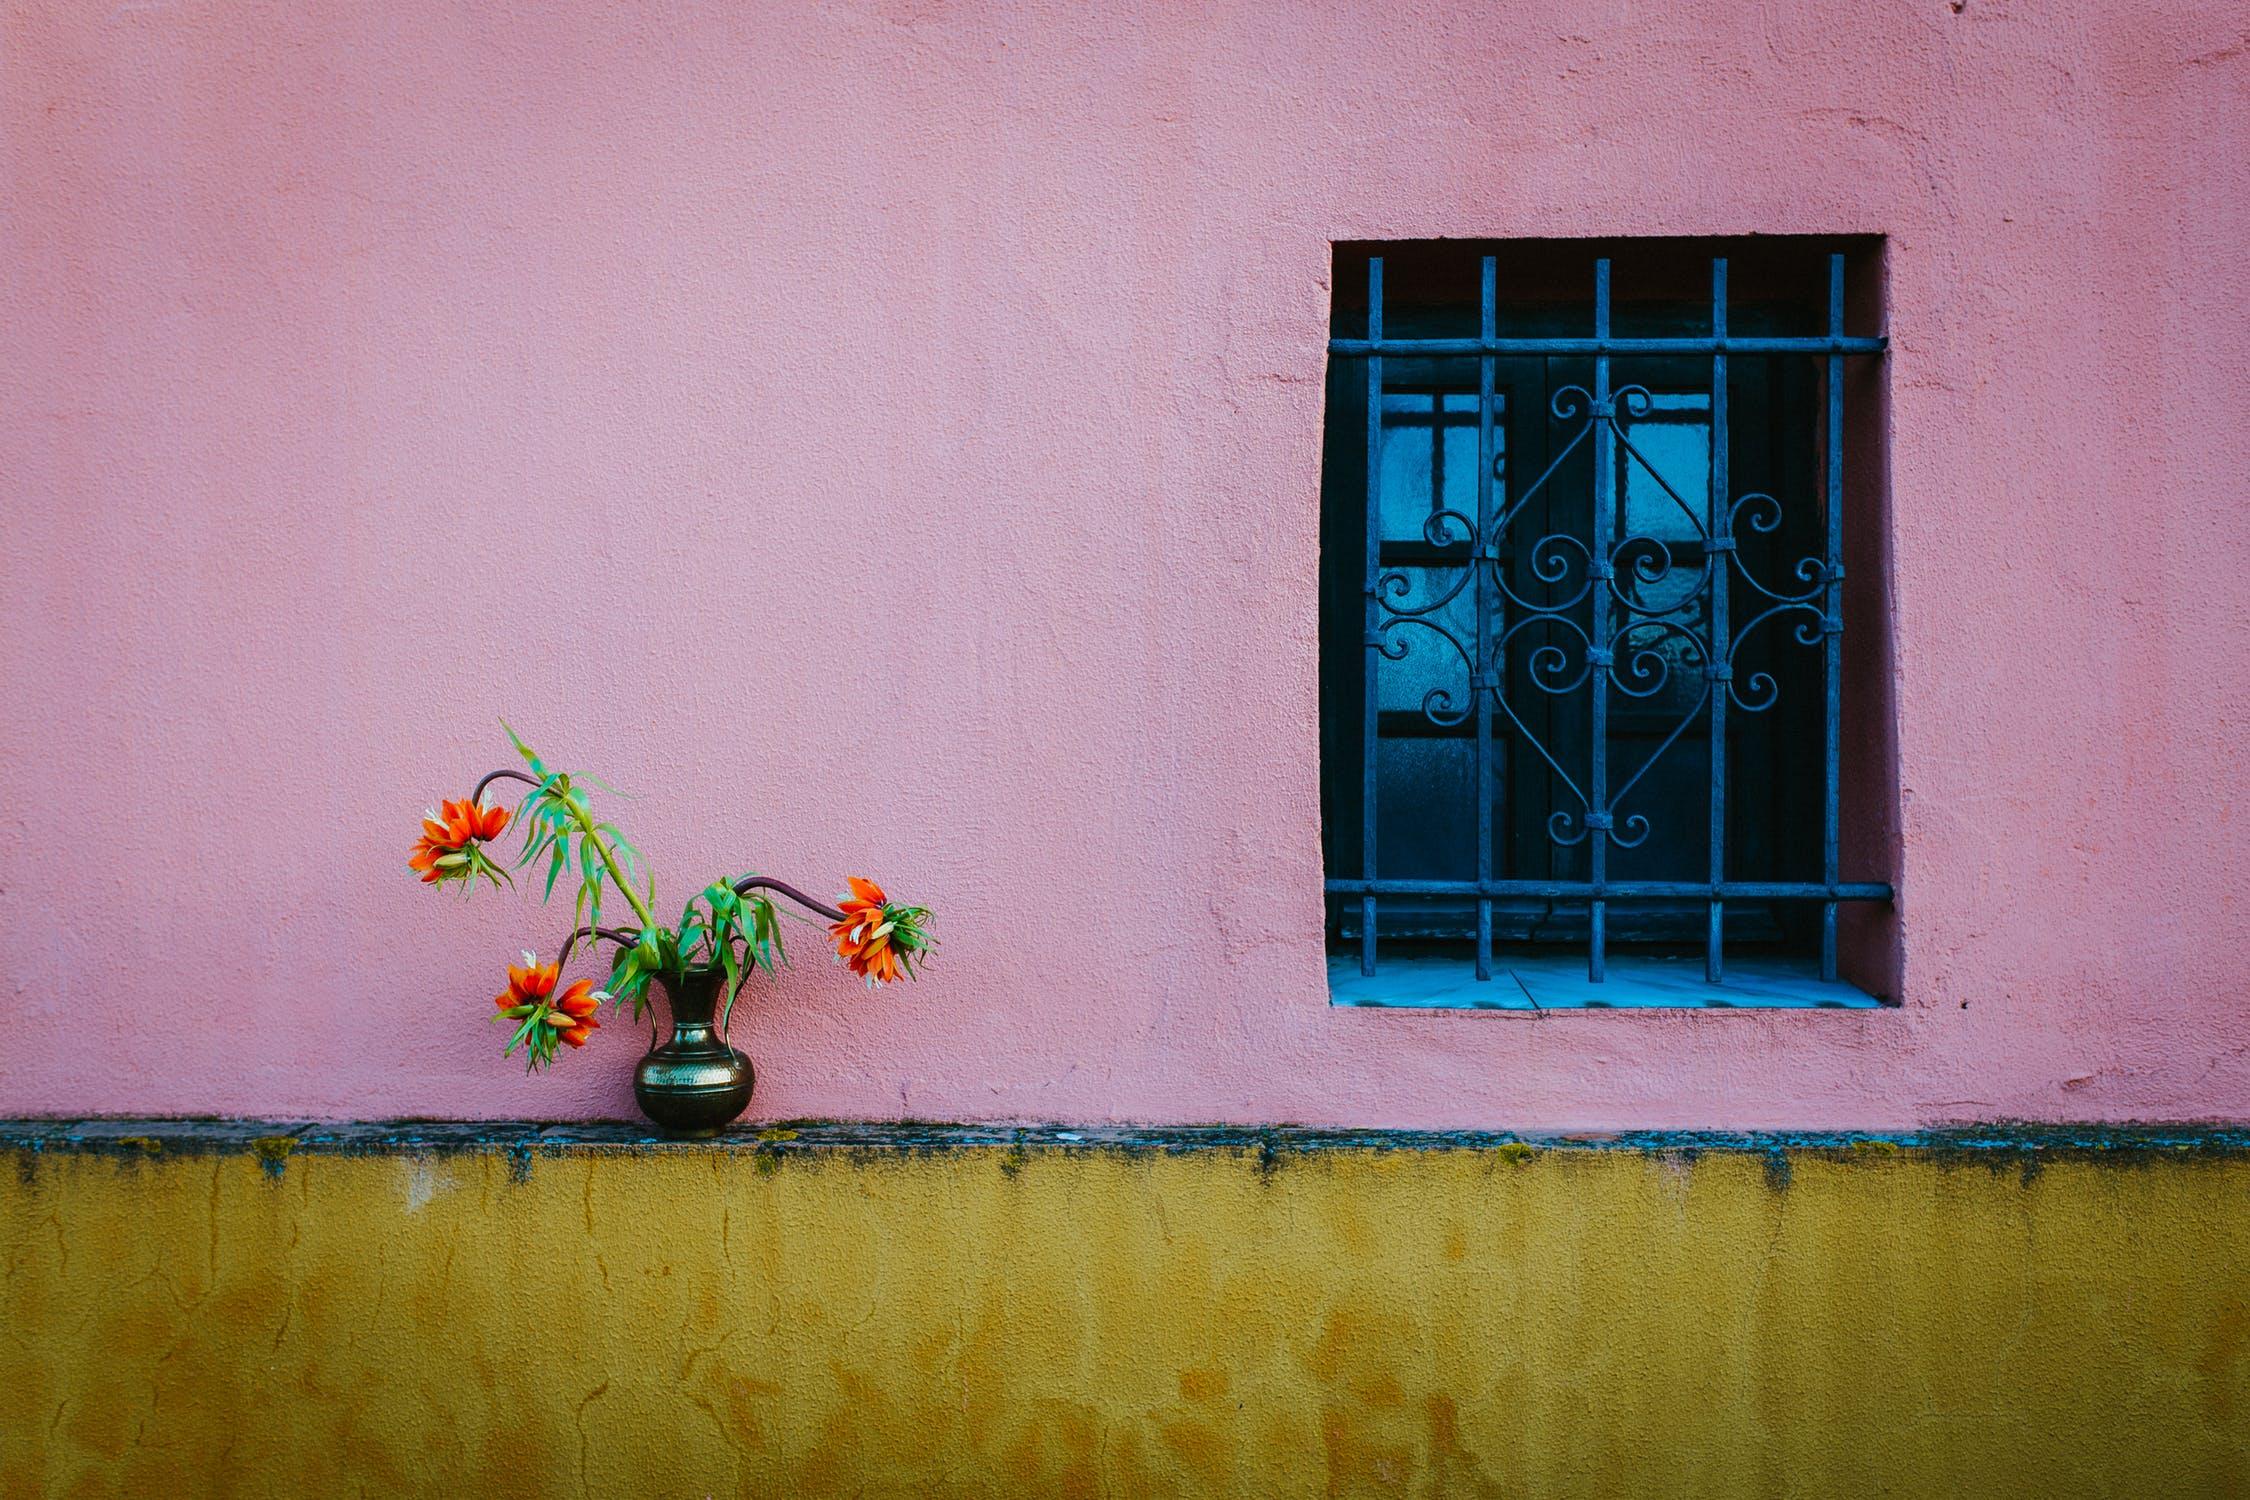 flower on the street, flower on the street